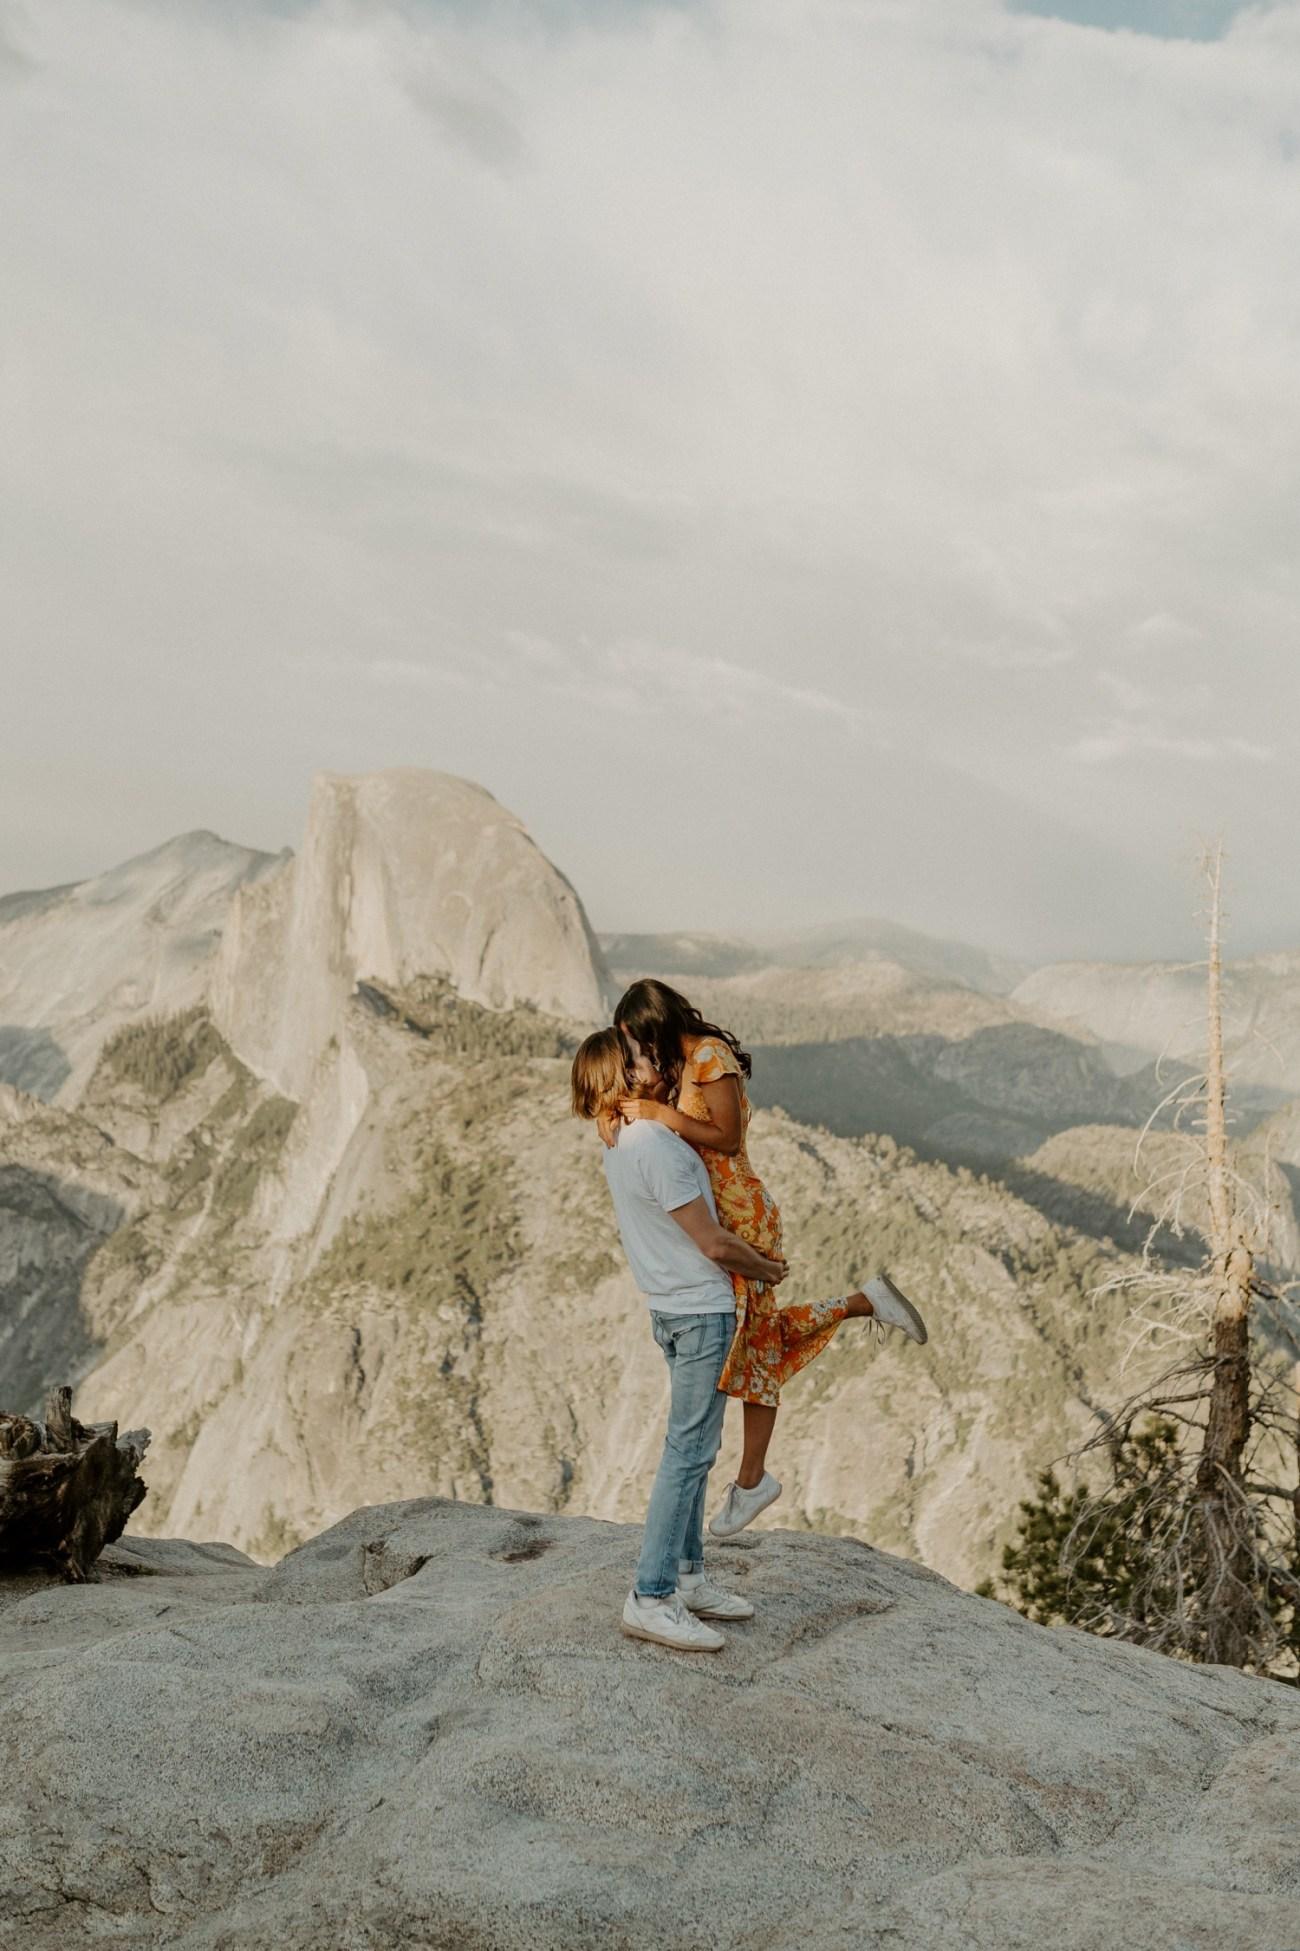 Sunset Yosemite Glacier Point Engagement Session Anais Possamai Photography 09